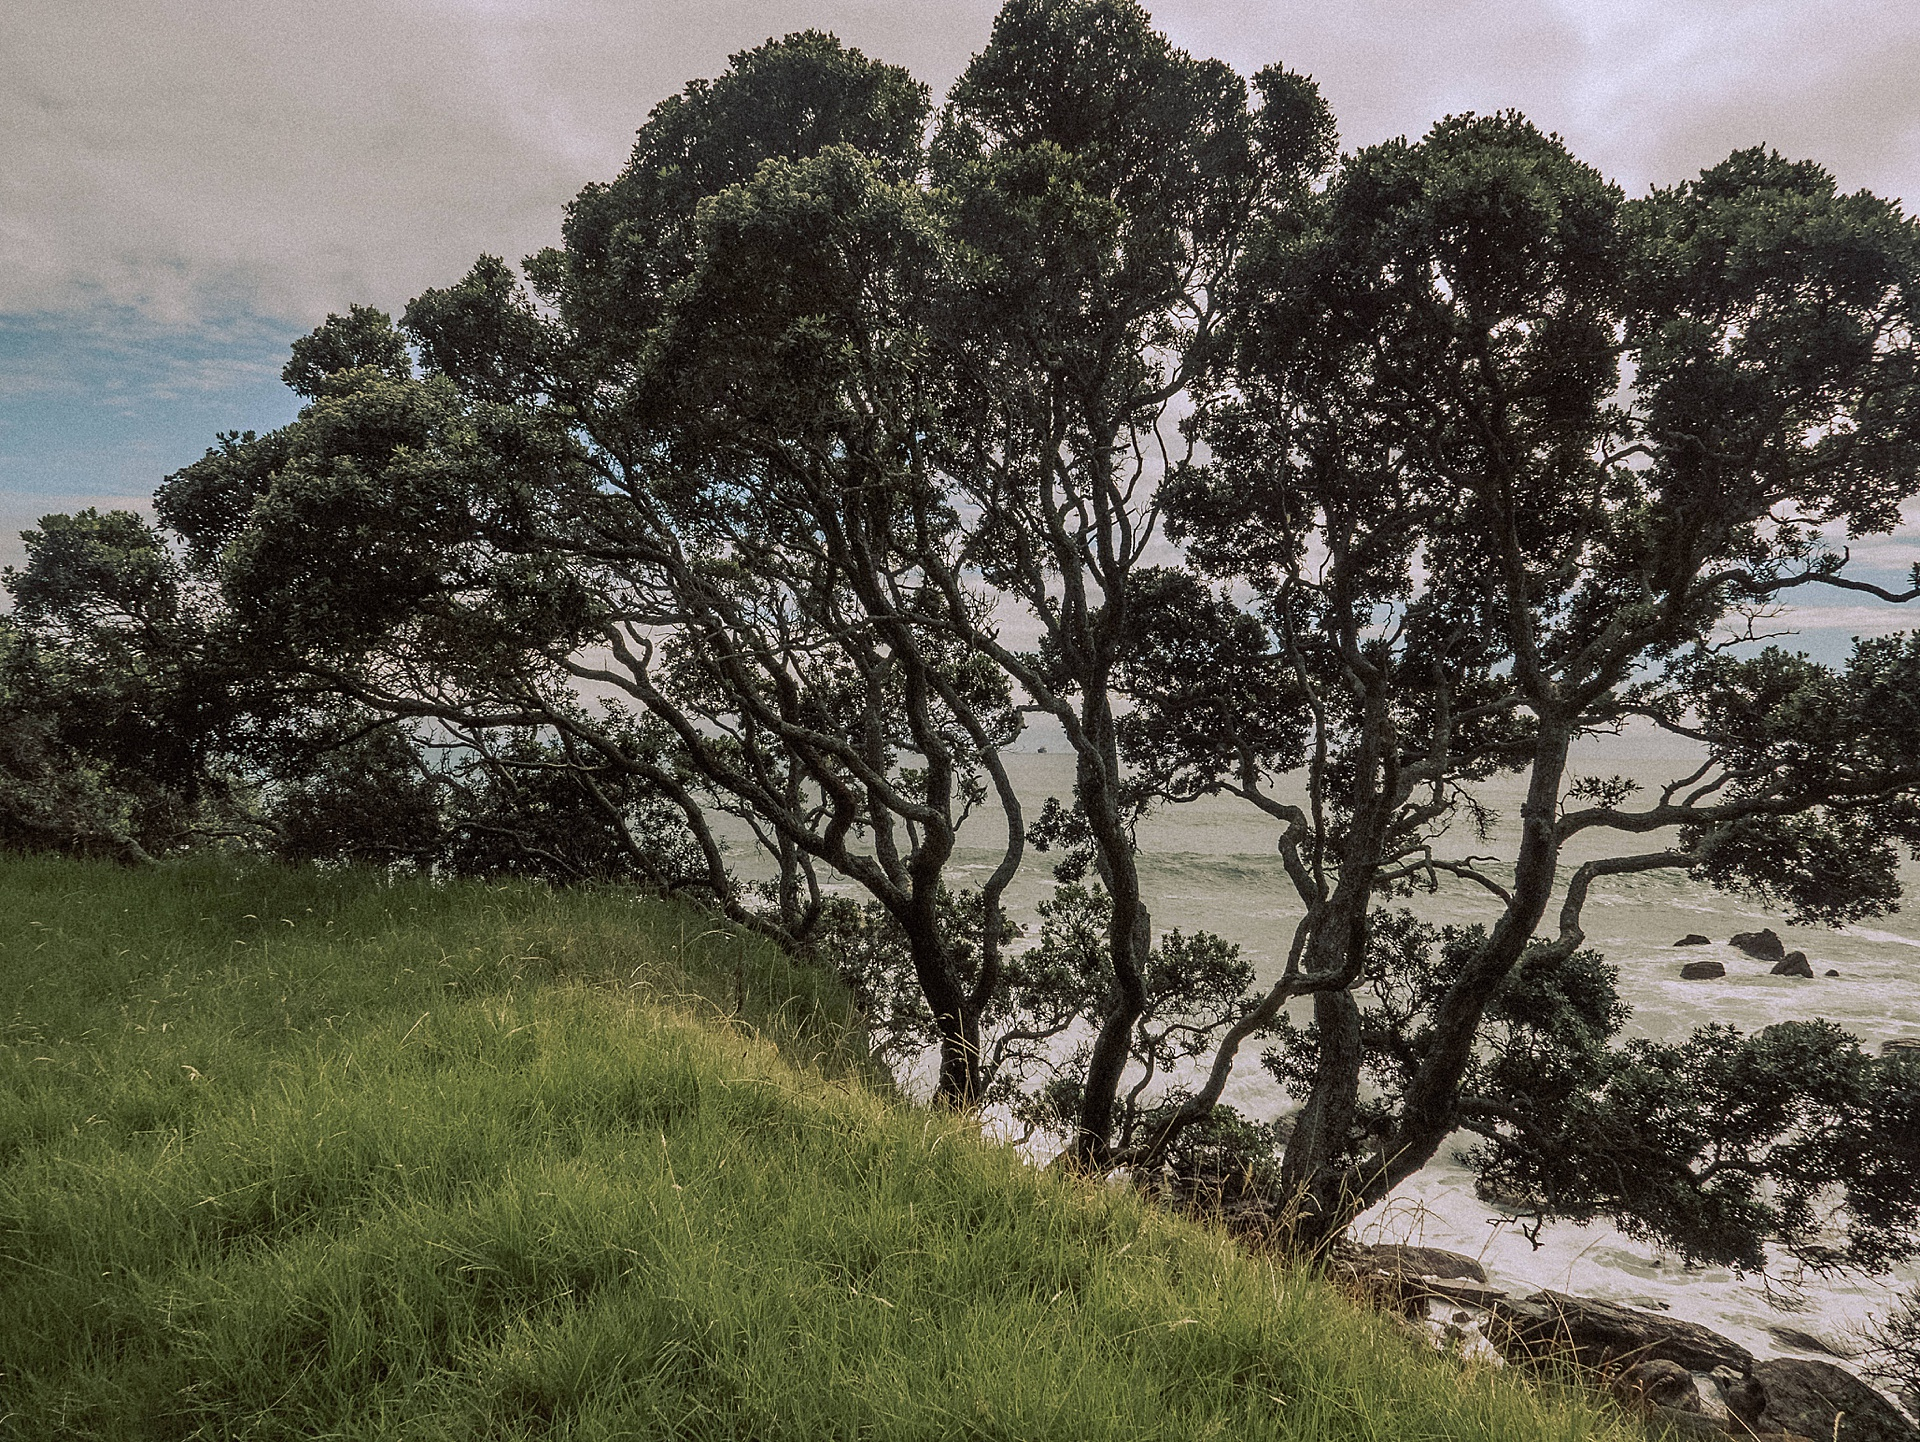 family-roadtrip-neuseeland-travelnewzealand-danielzube_0639.jpg